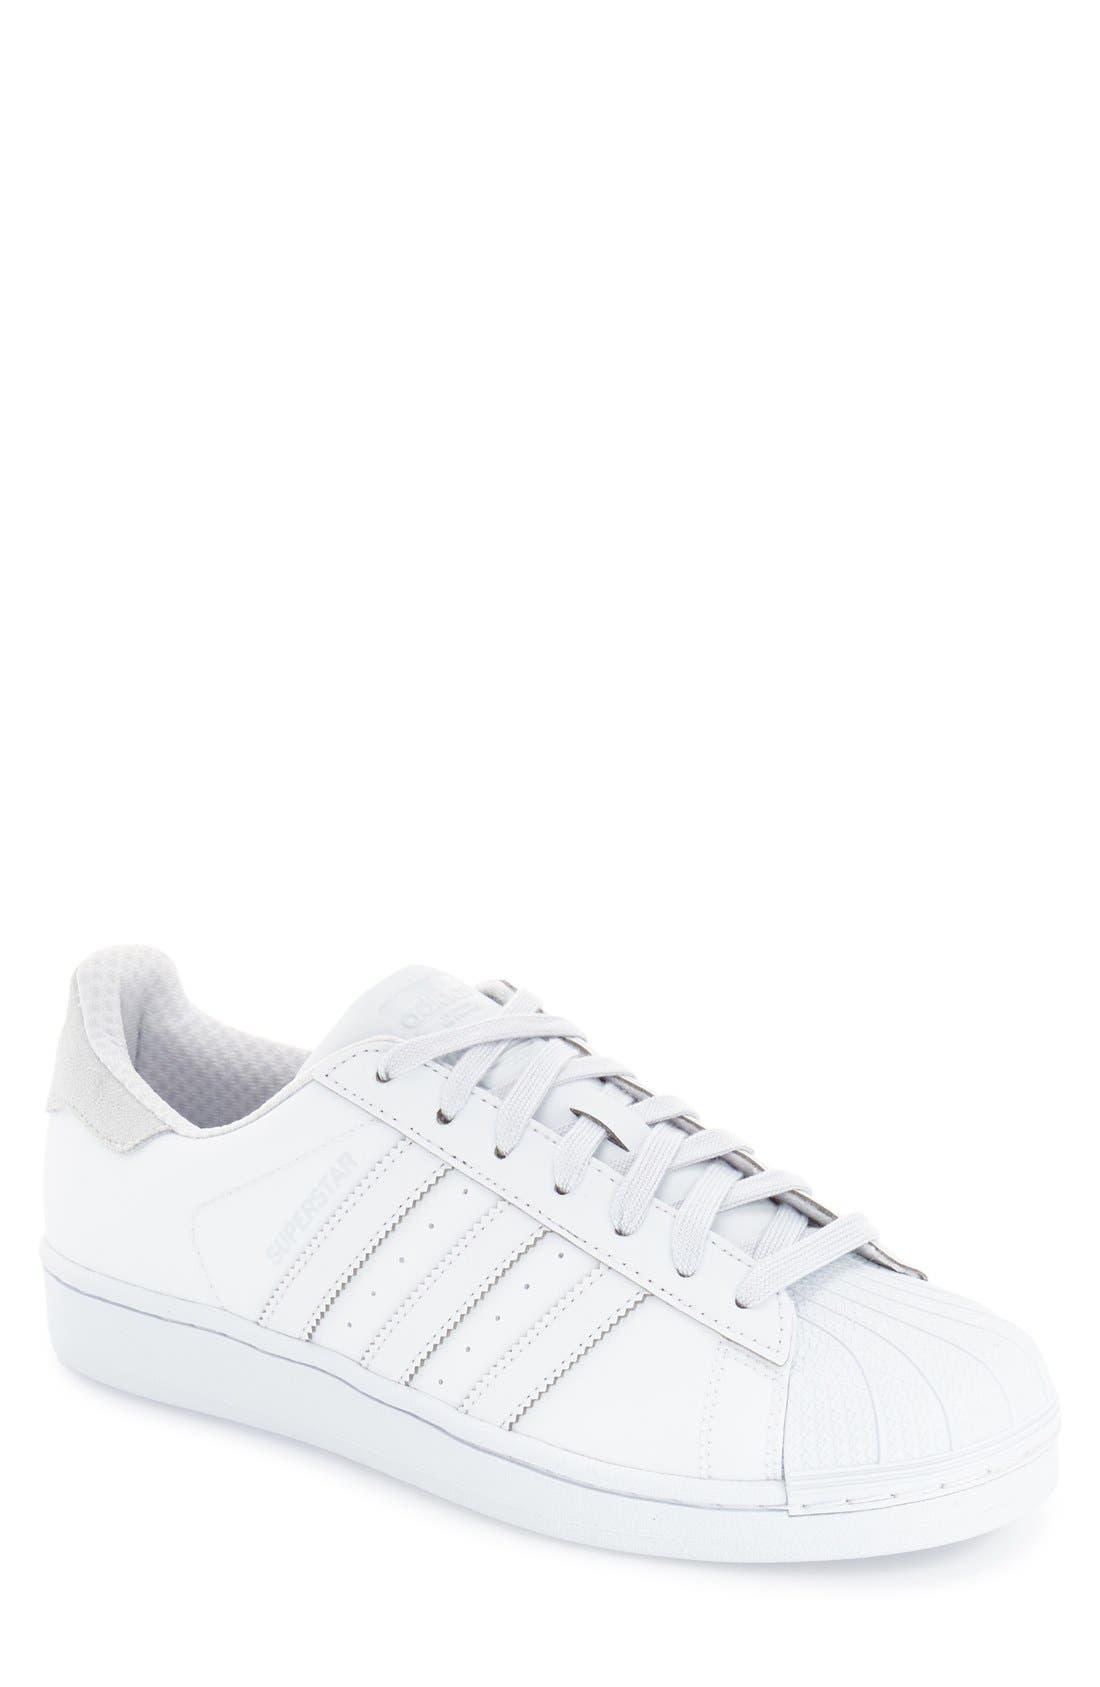 Main Image - adidas 'Superstar ADICOLOR' Sneaker (Men)